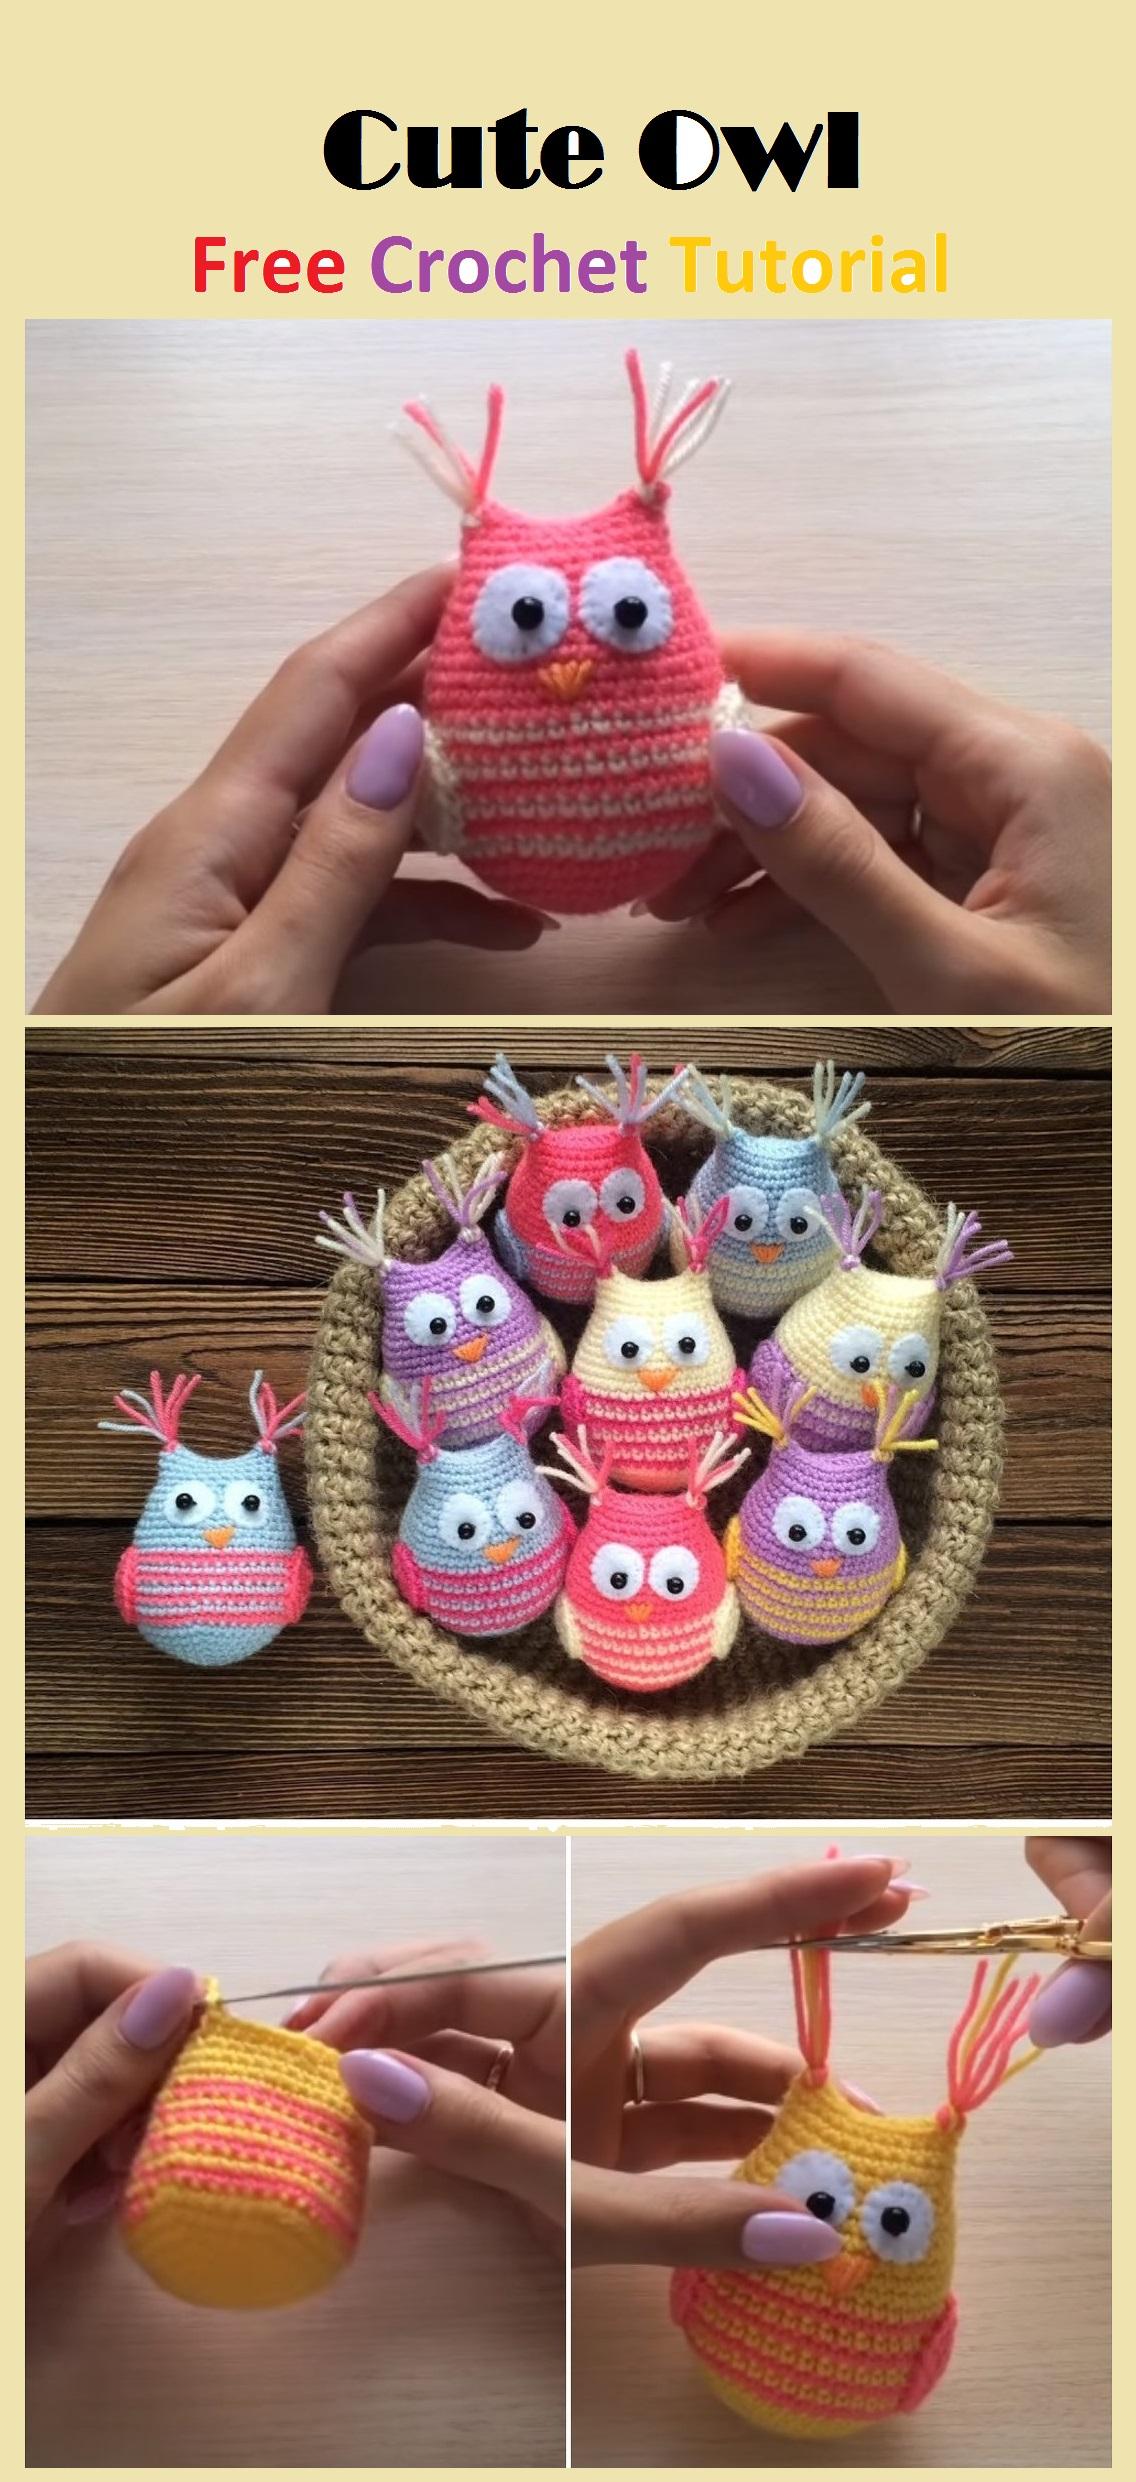 Amigurumi Crochet Owl Free Patterns Instructions: | Búhos de ... | 2482x1136